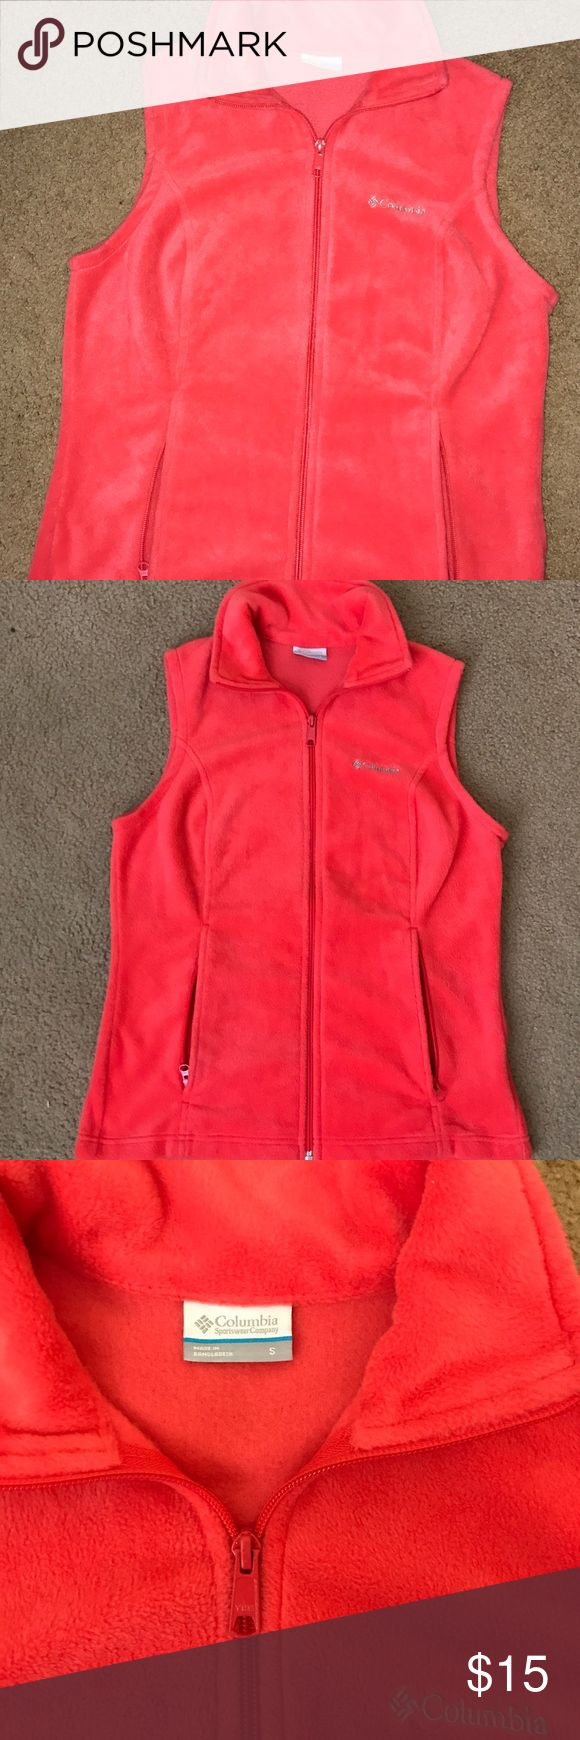 Colombia fleece vest. NWOT Colombia coral fleece vest. NWOT. Perfect condition. Smoke free home Columbia Jackets & Coats Vests